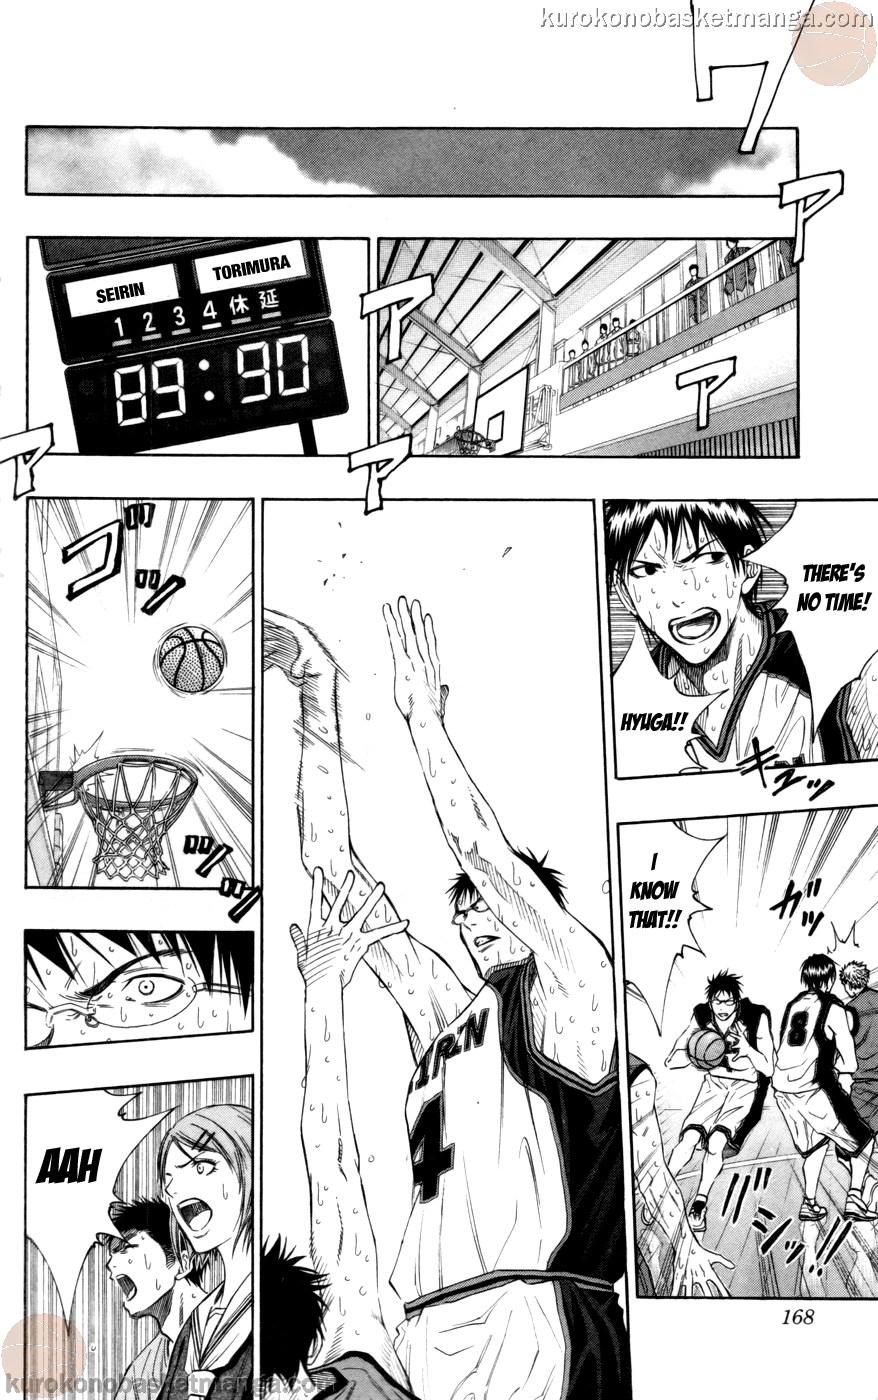 Kuroko no Basket Manga Chapter 98 - Image 02